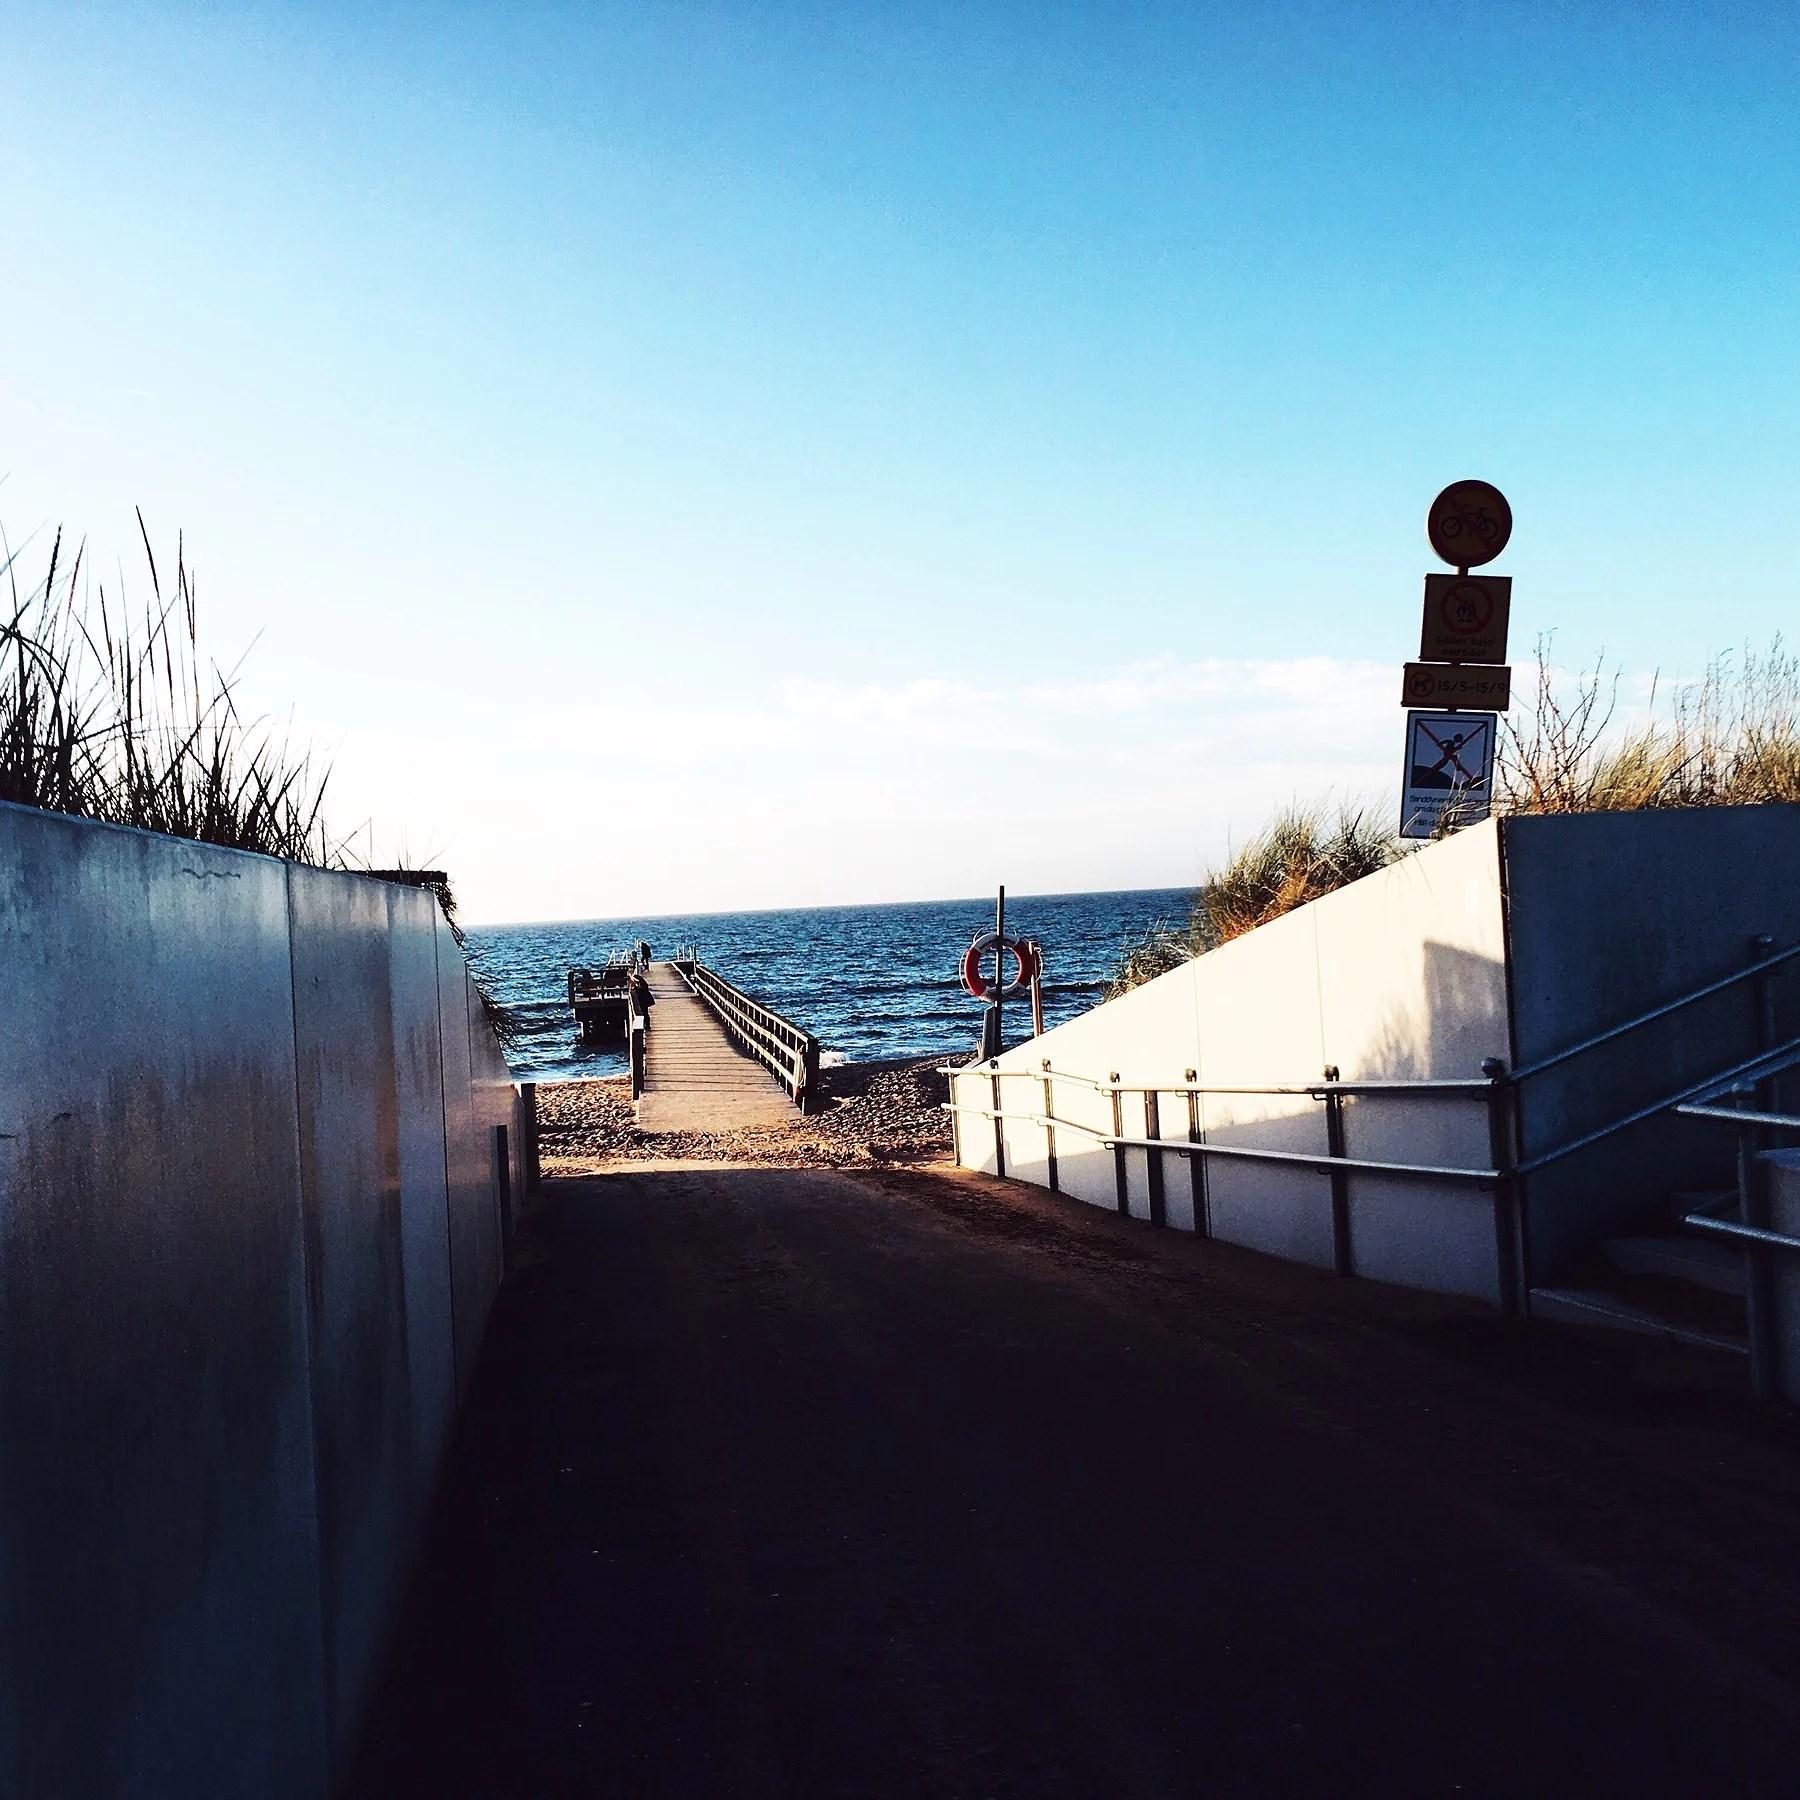 STUDY BREAK AT THE BEACH